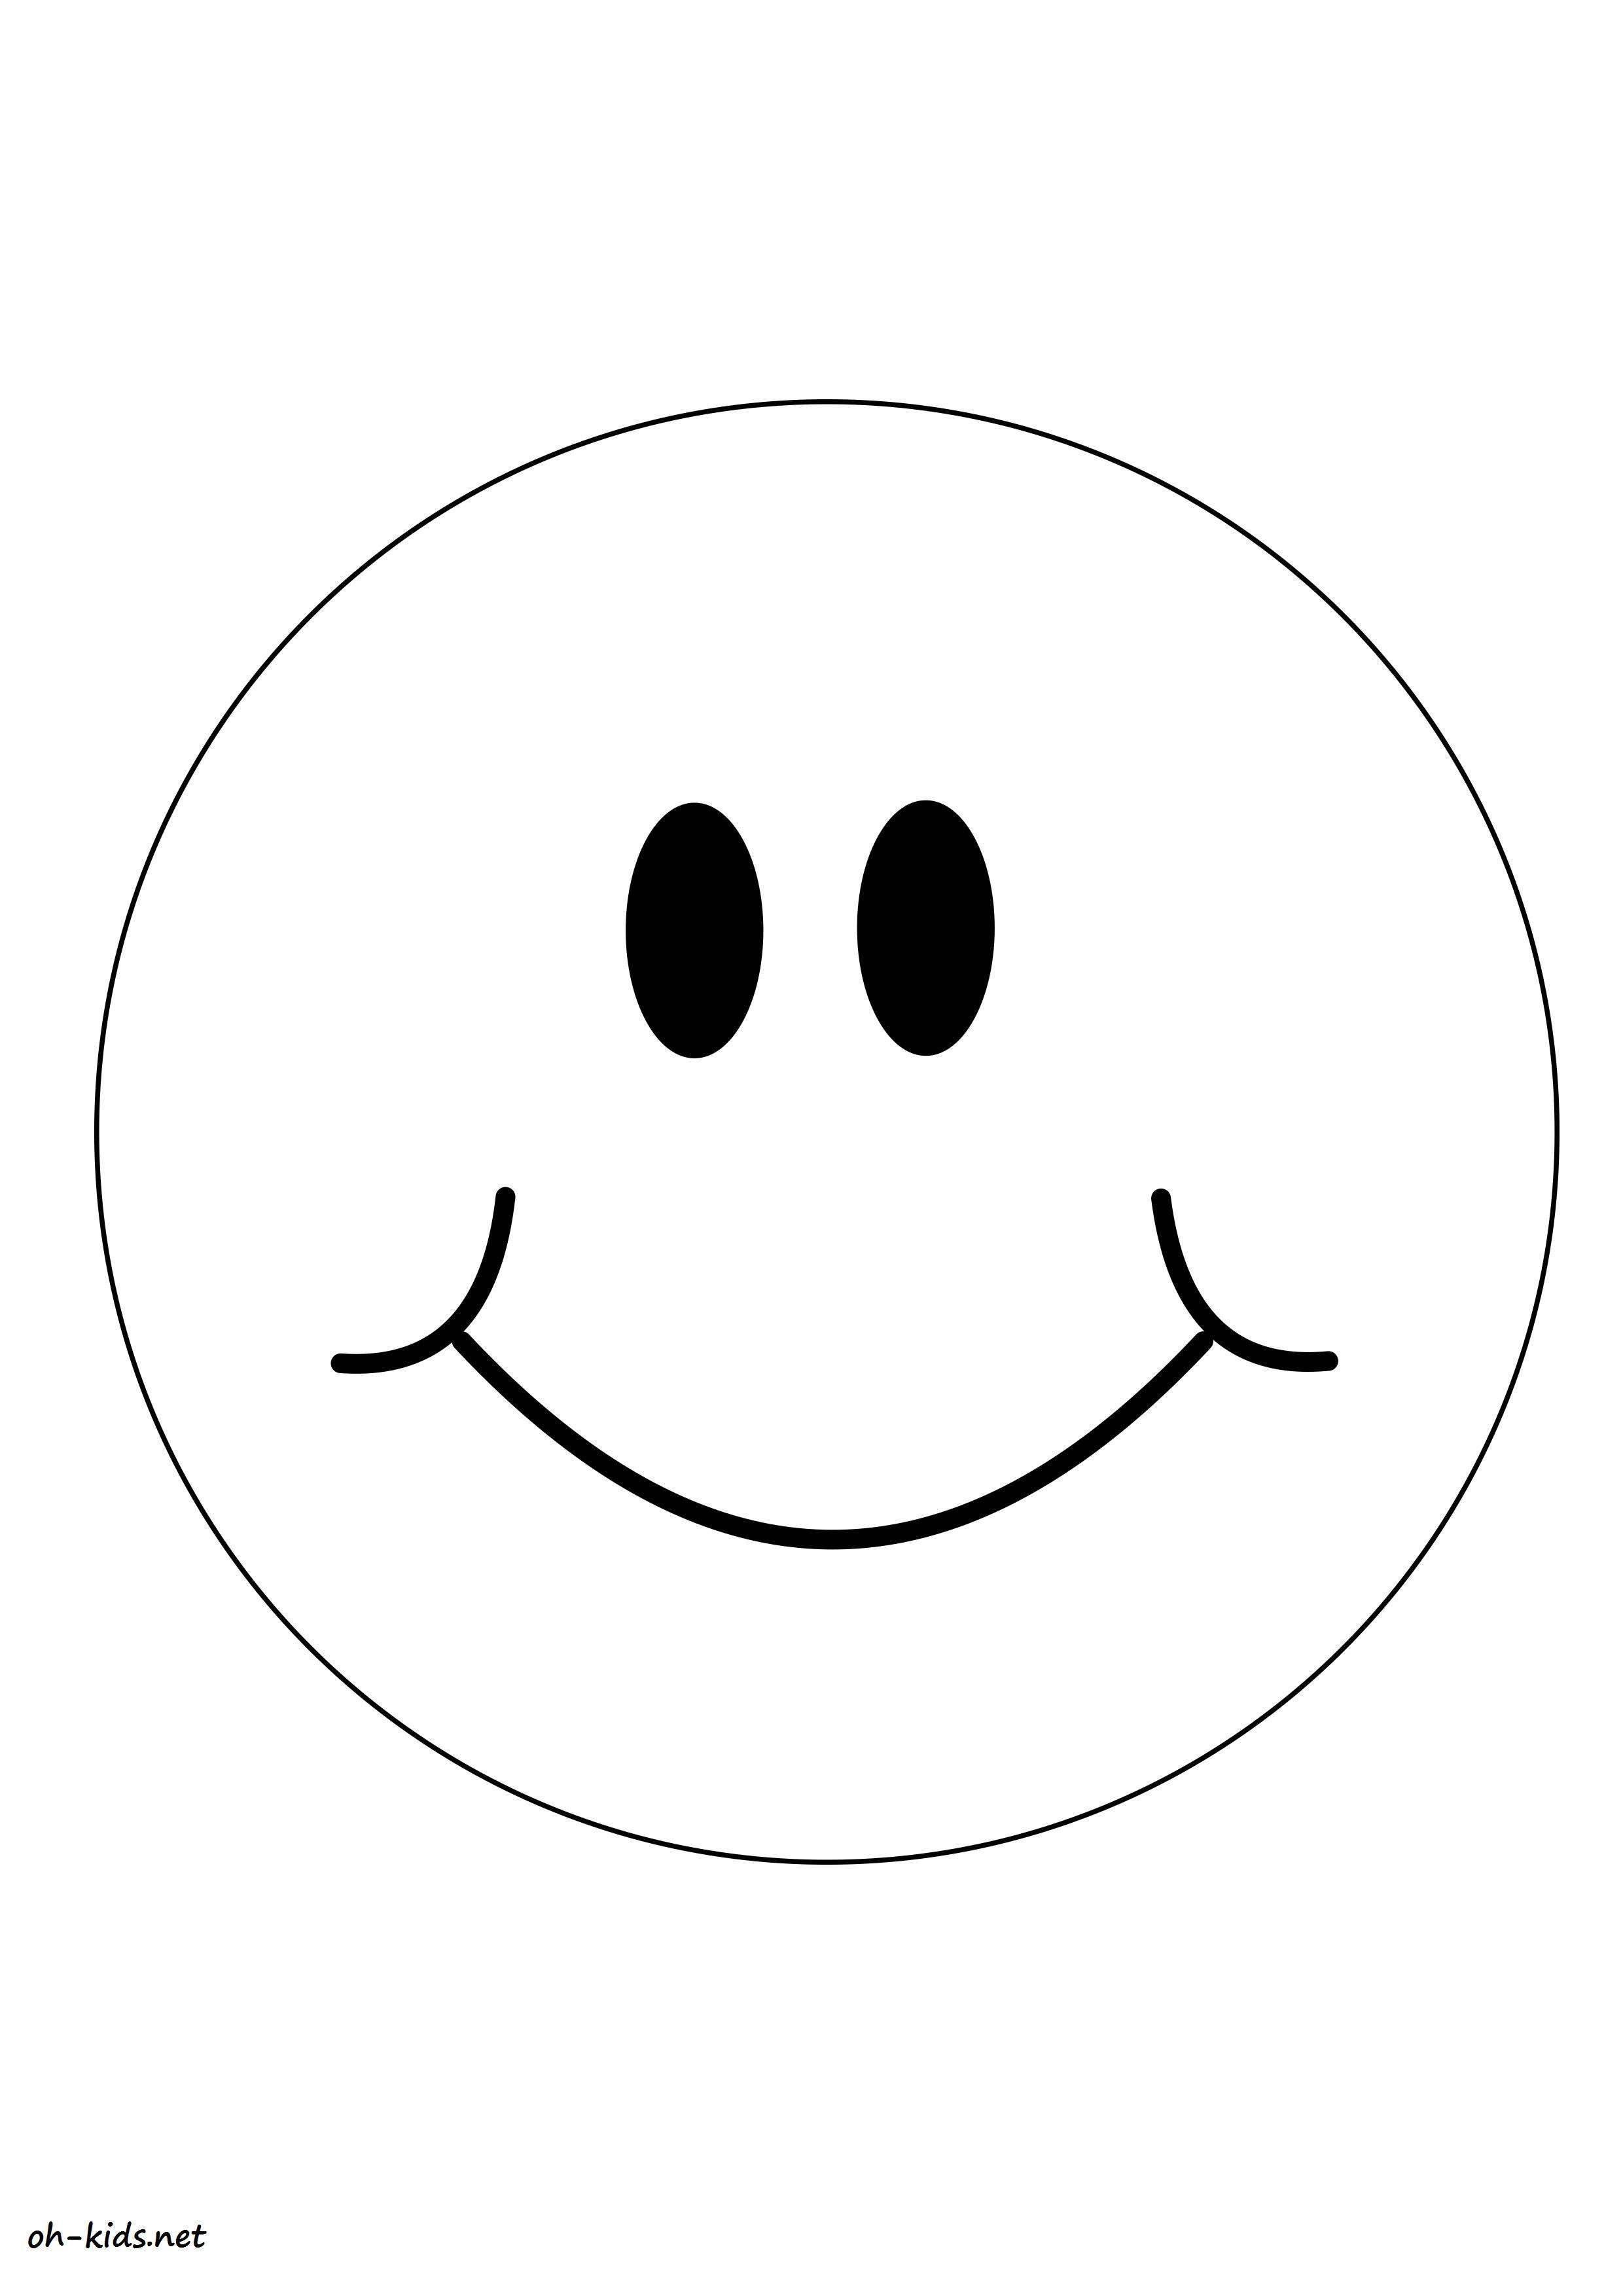 Dessin 754 Coloriage Smiley à Imprimer Oh Kidsnet